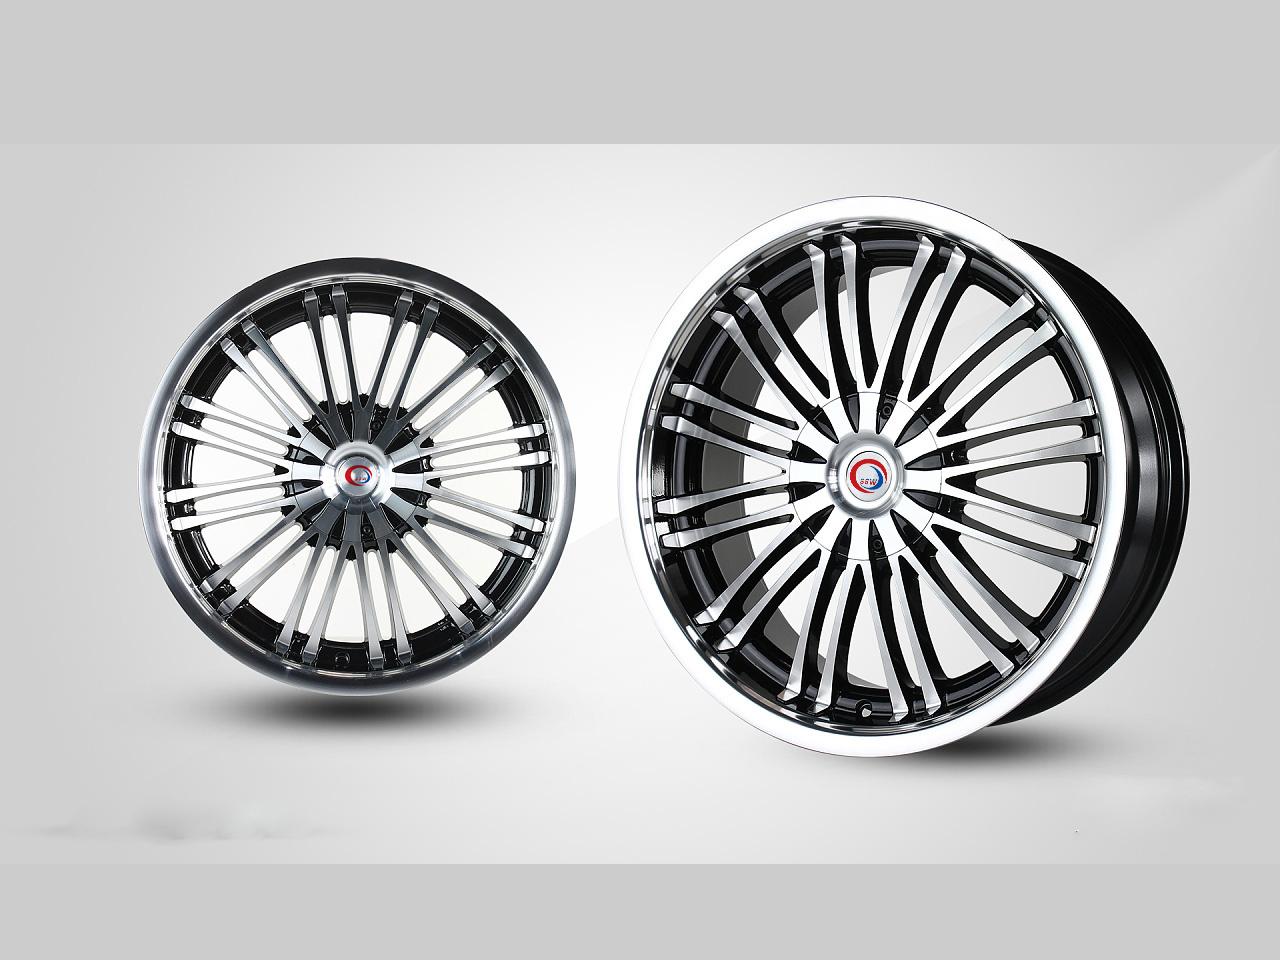 16-28 inches wheels aluminum alloy wheels a17